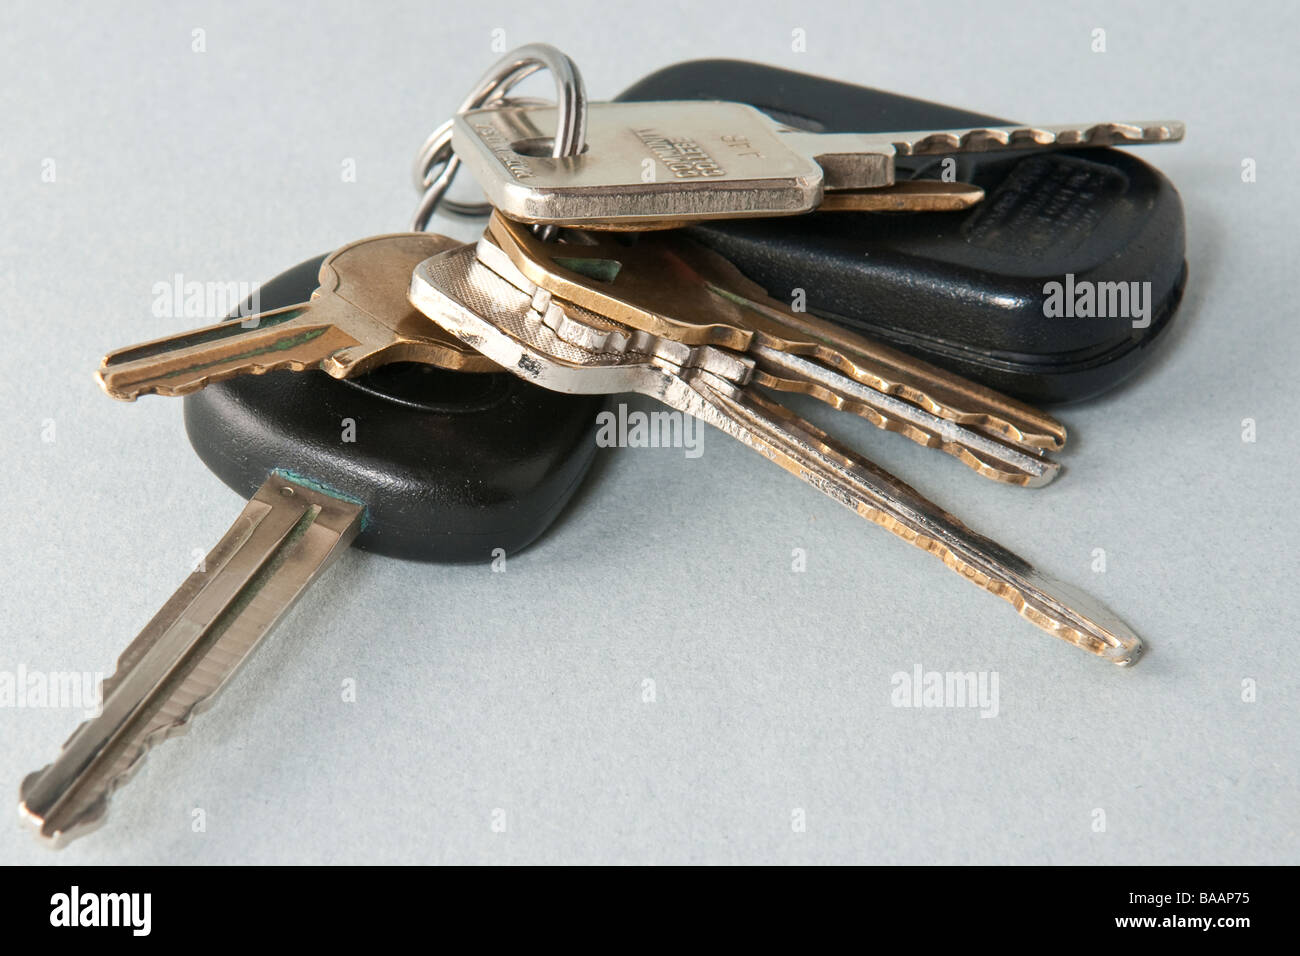 Pack of keys and car remote chipkey door opener - Stock Image